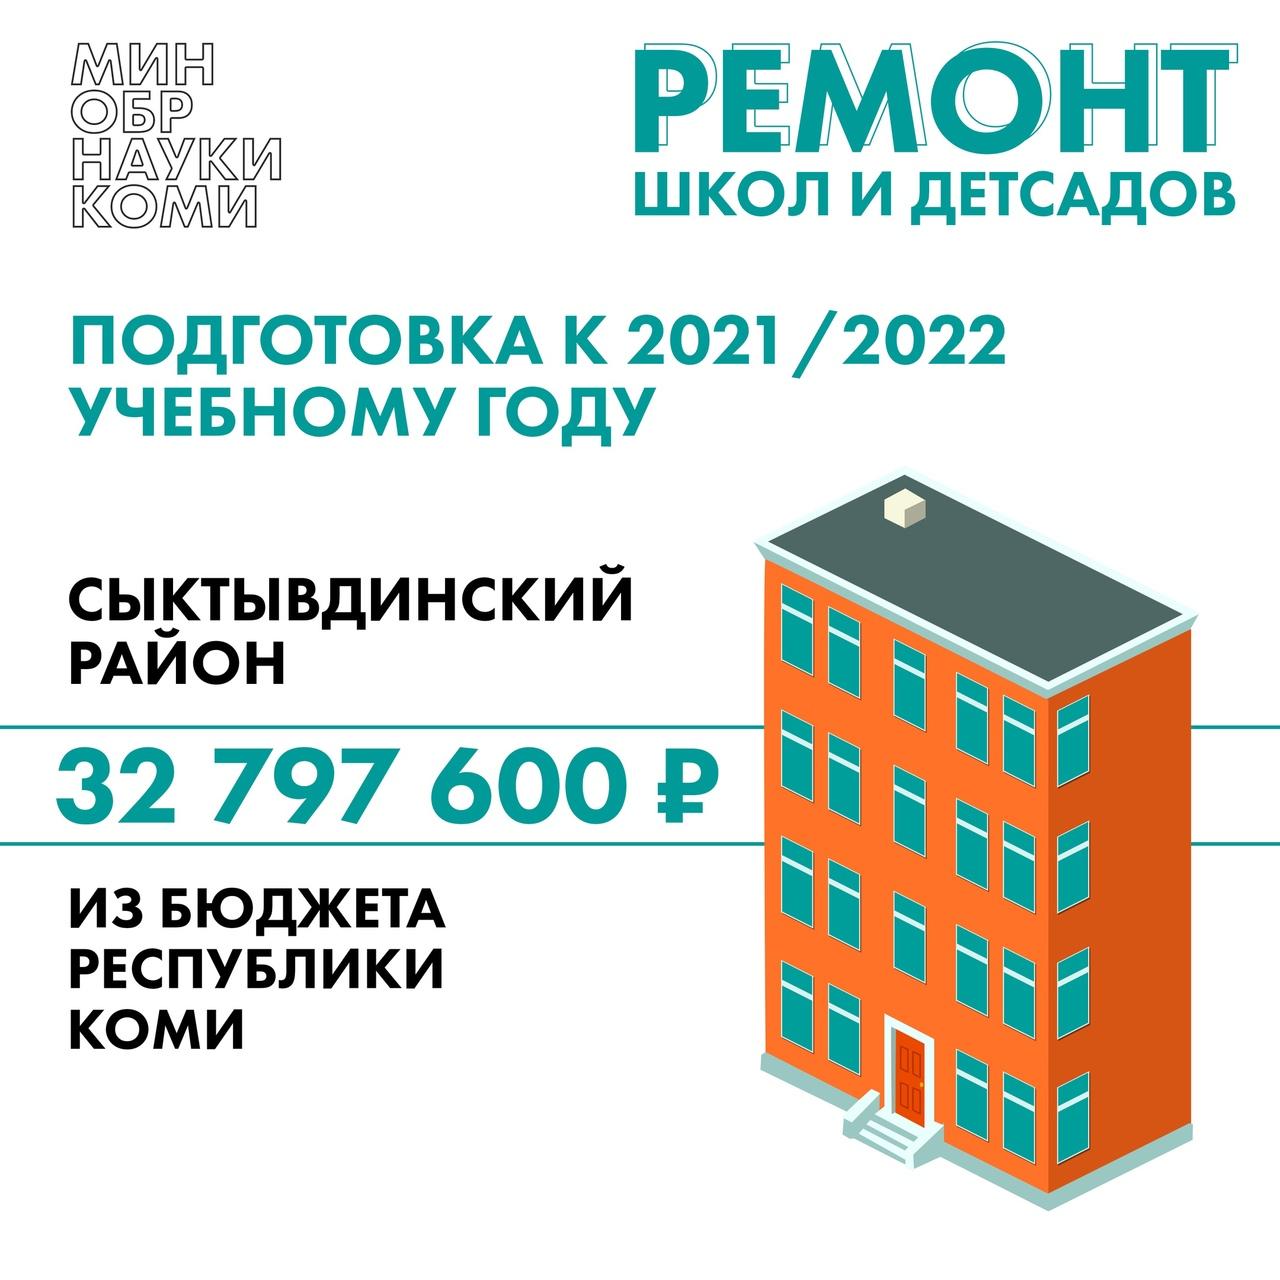 syktyvdinskiyjpg_1631357093467.jpeg